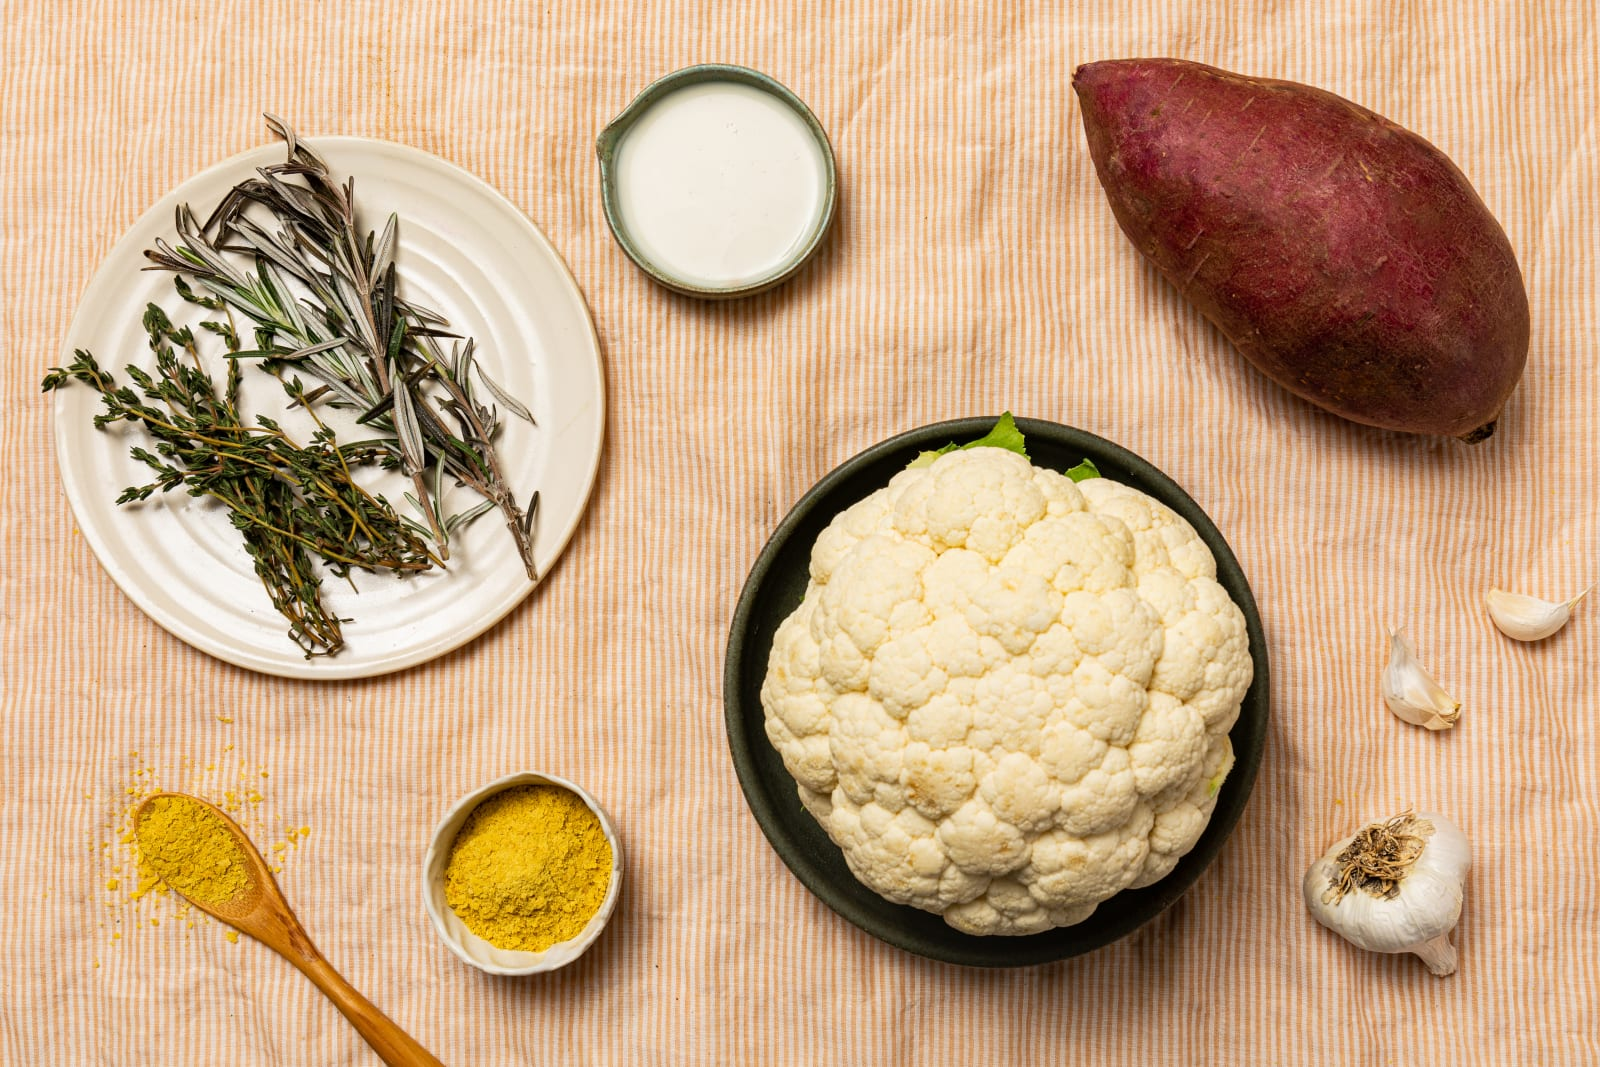 Yumi Cauliflower Soup ingredients image